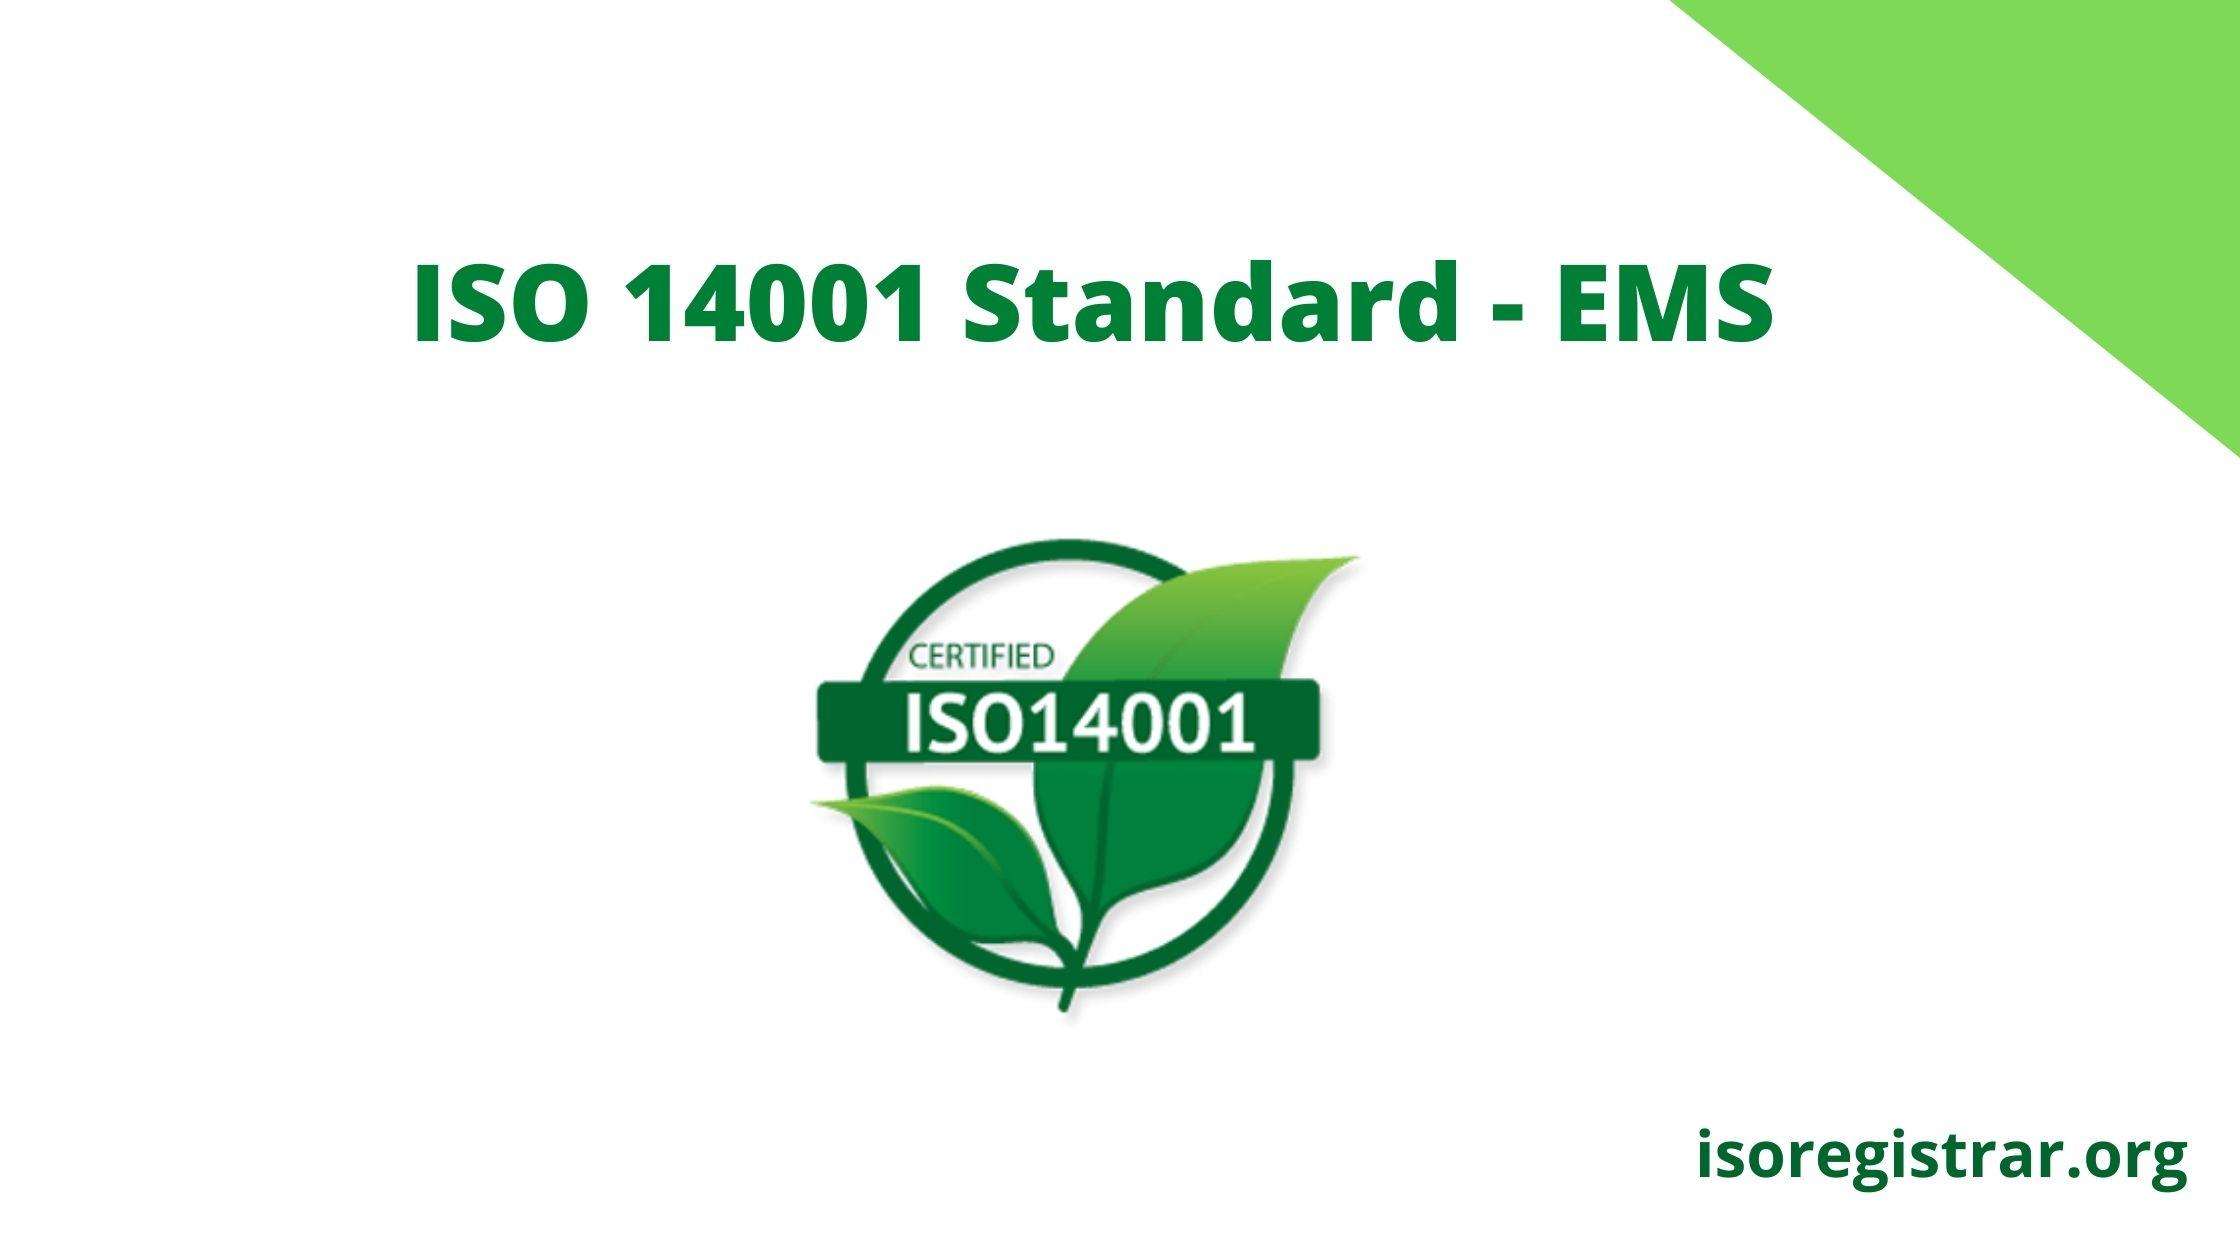 ISO 14001 Standard - Environmental Management System